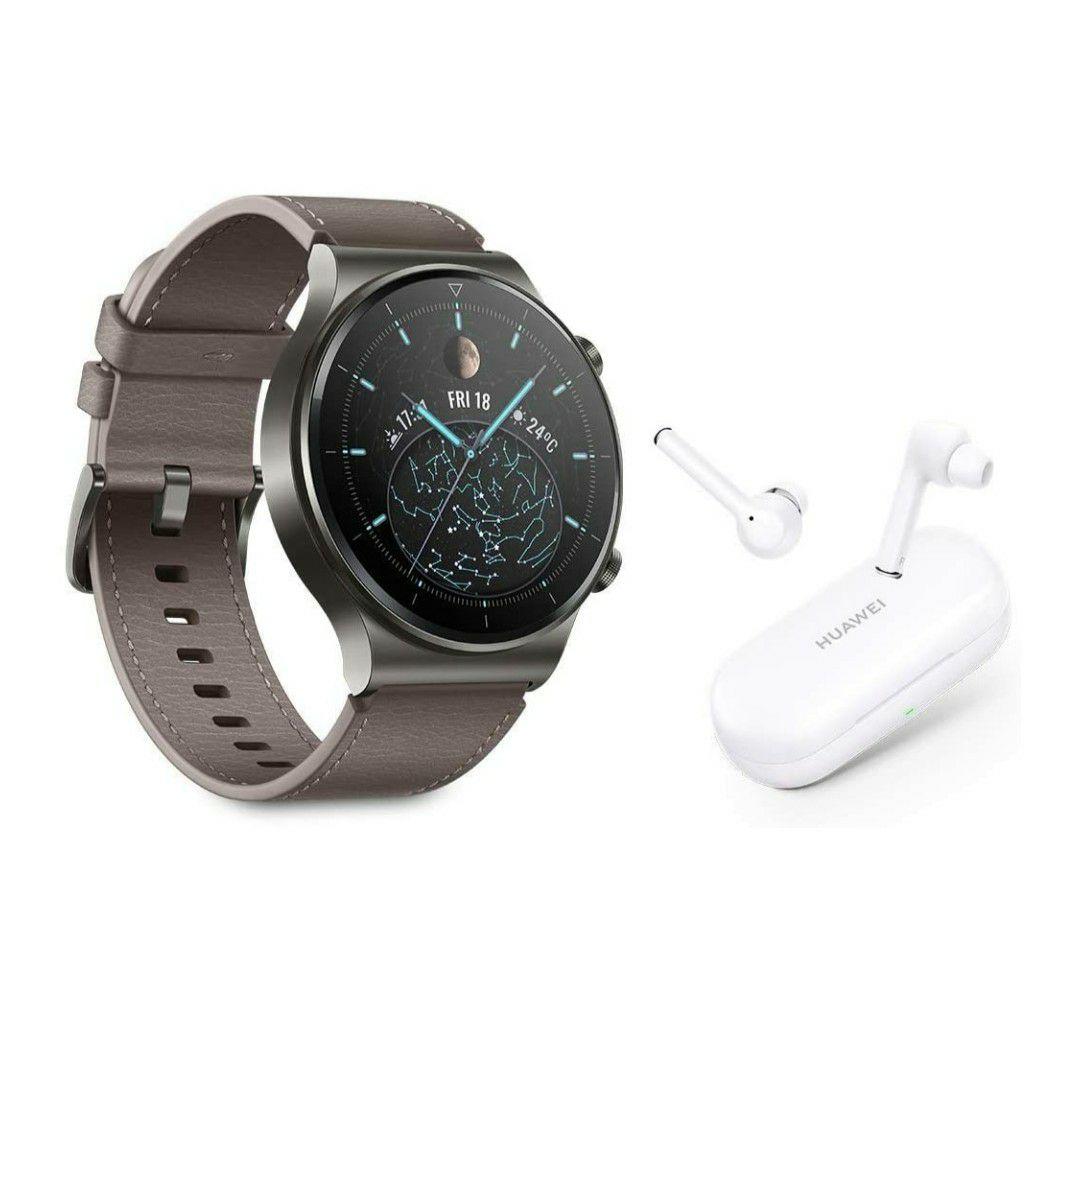 Huawei Watch GT2 Pro + Freebuds 3i regalo